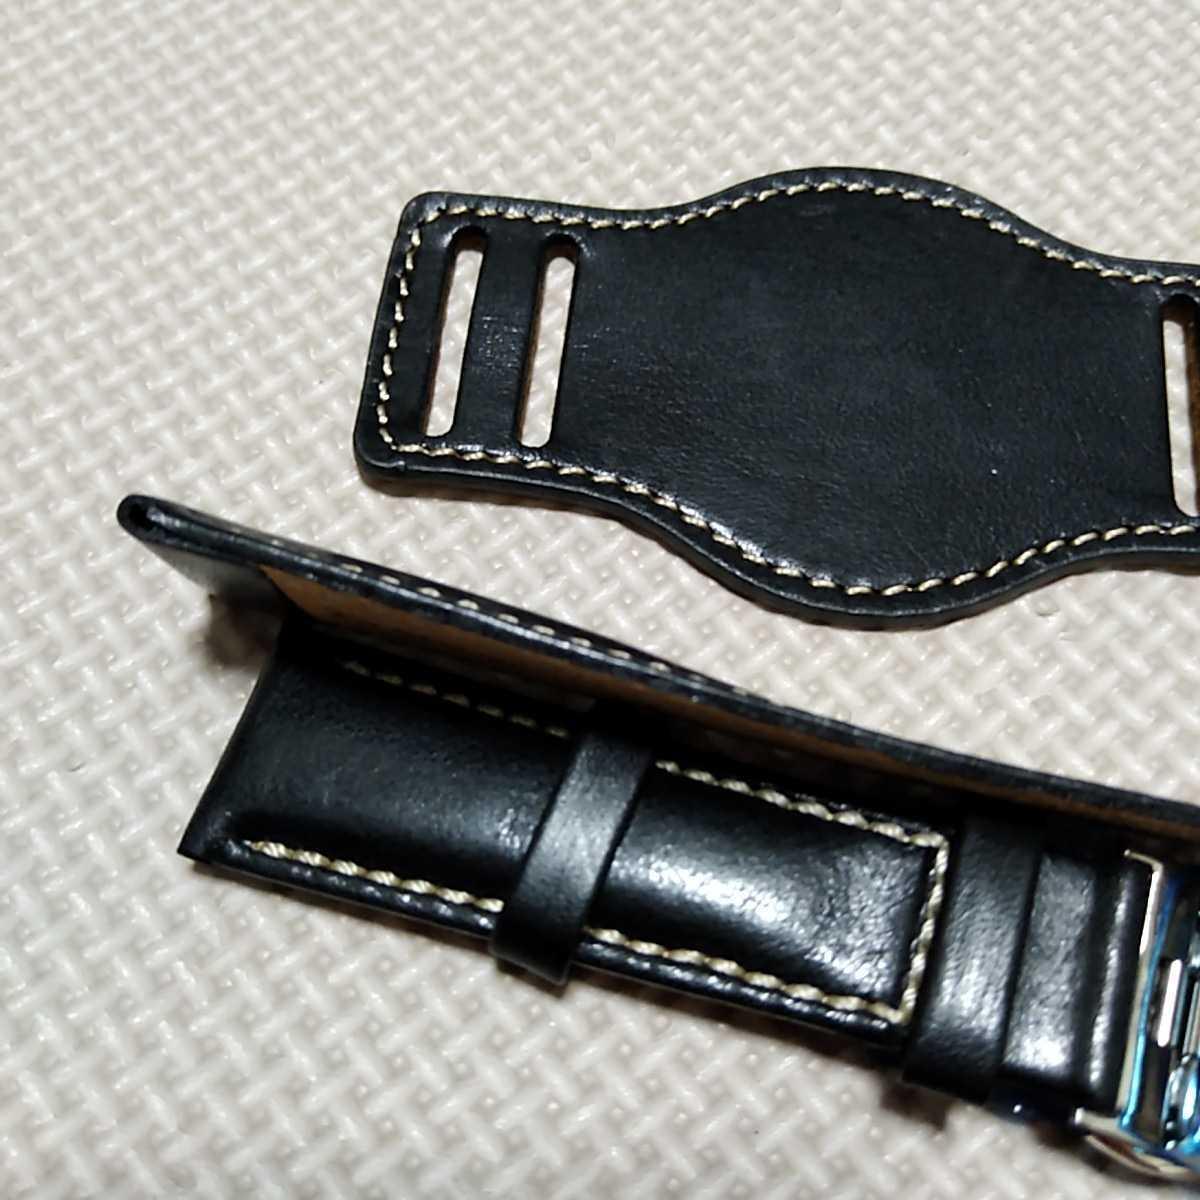 No71 ブンド BUND 本革レザーベルト 腕時計ベルト 交換用ストラップ ブラック 21mm 未使用 Dバックル 高品質 ドイツパイロット 空軍_画像6